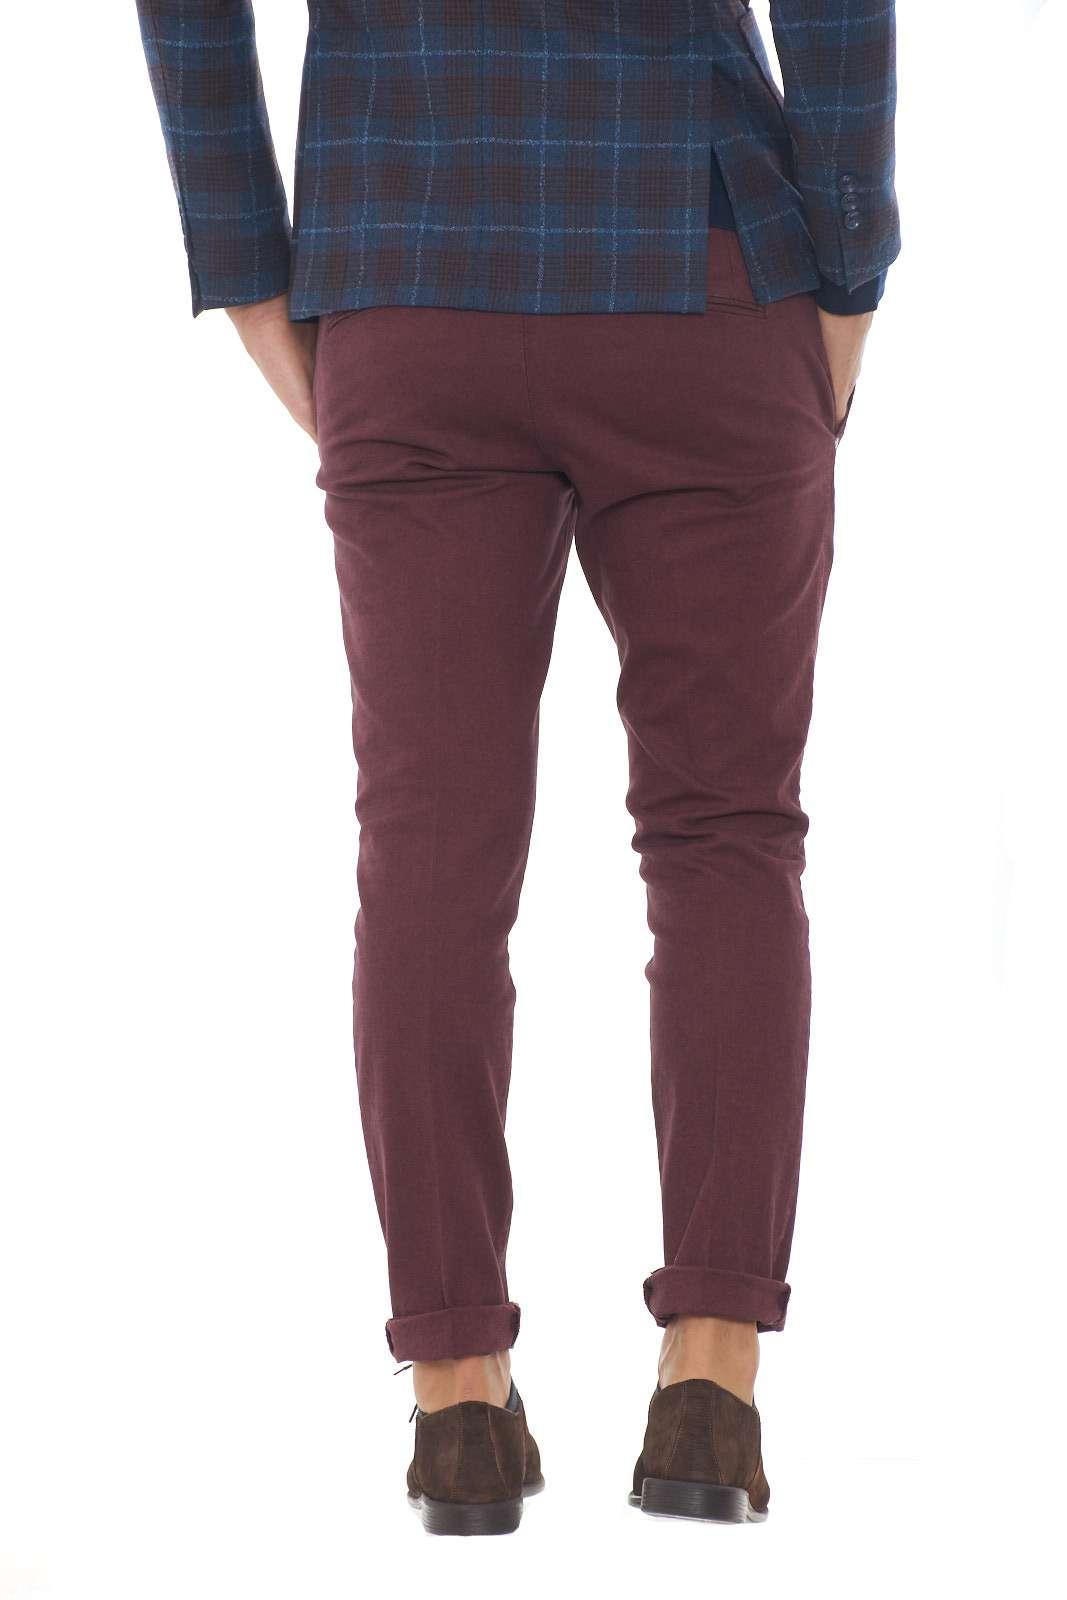 https://www.parmax.com/media/catalog/product/a/i/AI-outlet_parmax-pantaloni-uomo-Desica-POSITANO%20CN%2011-C.jpg